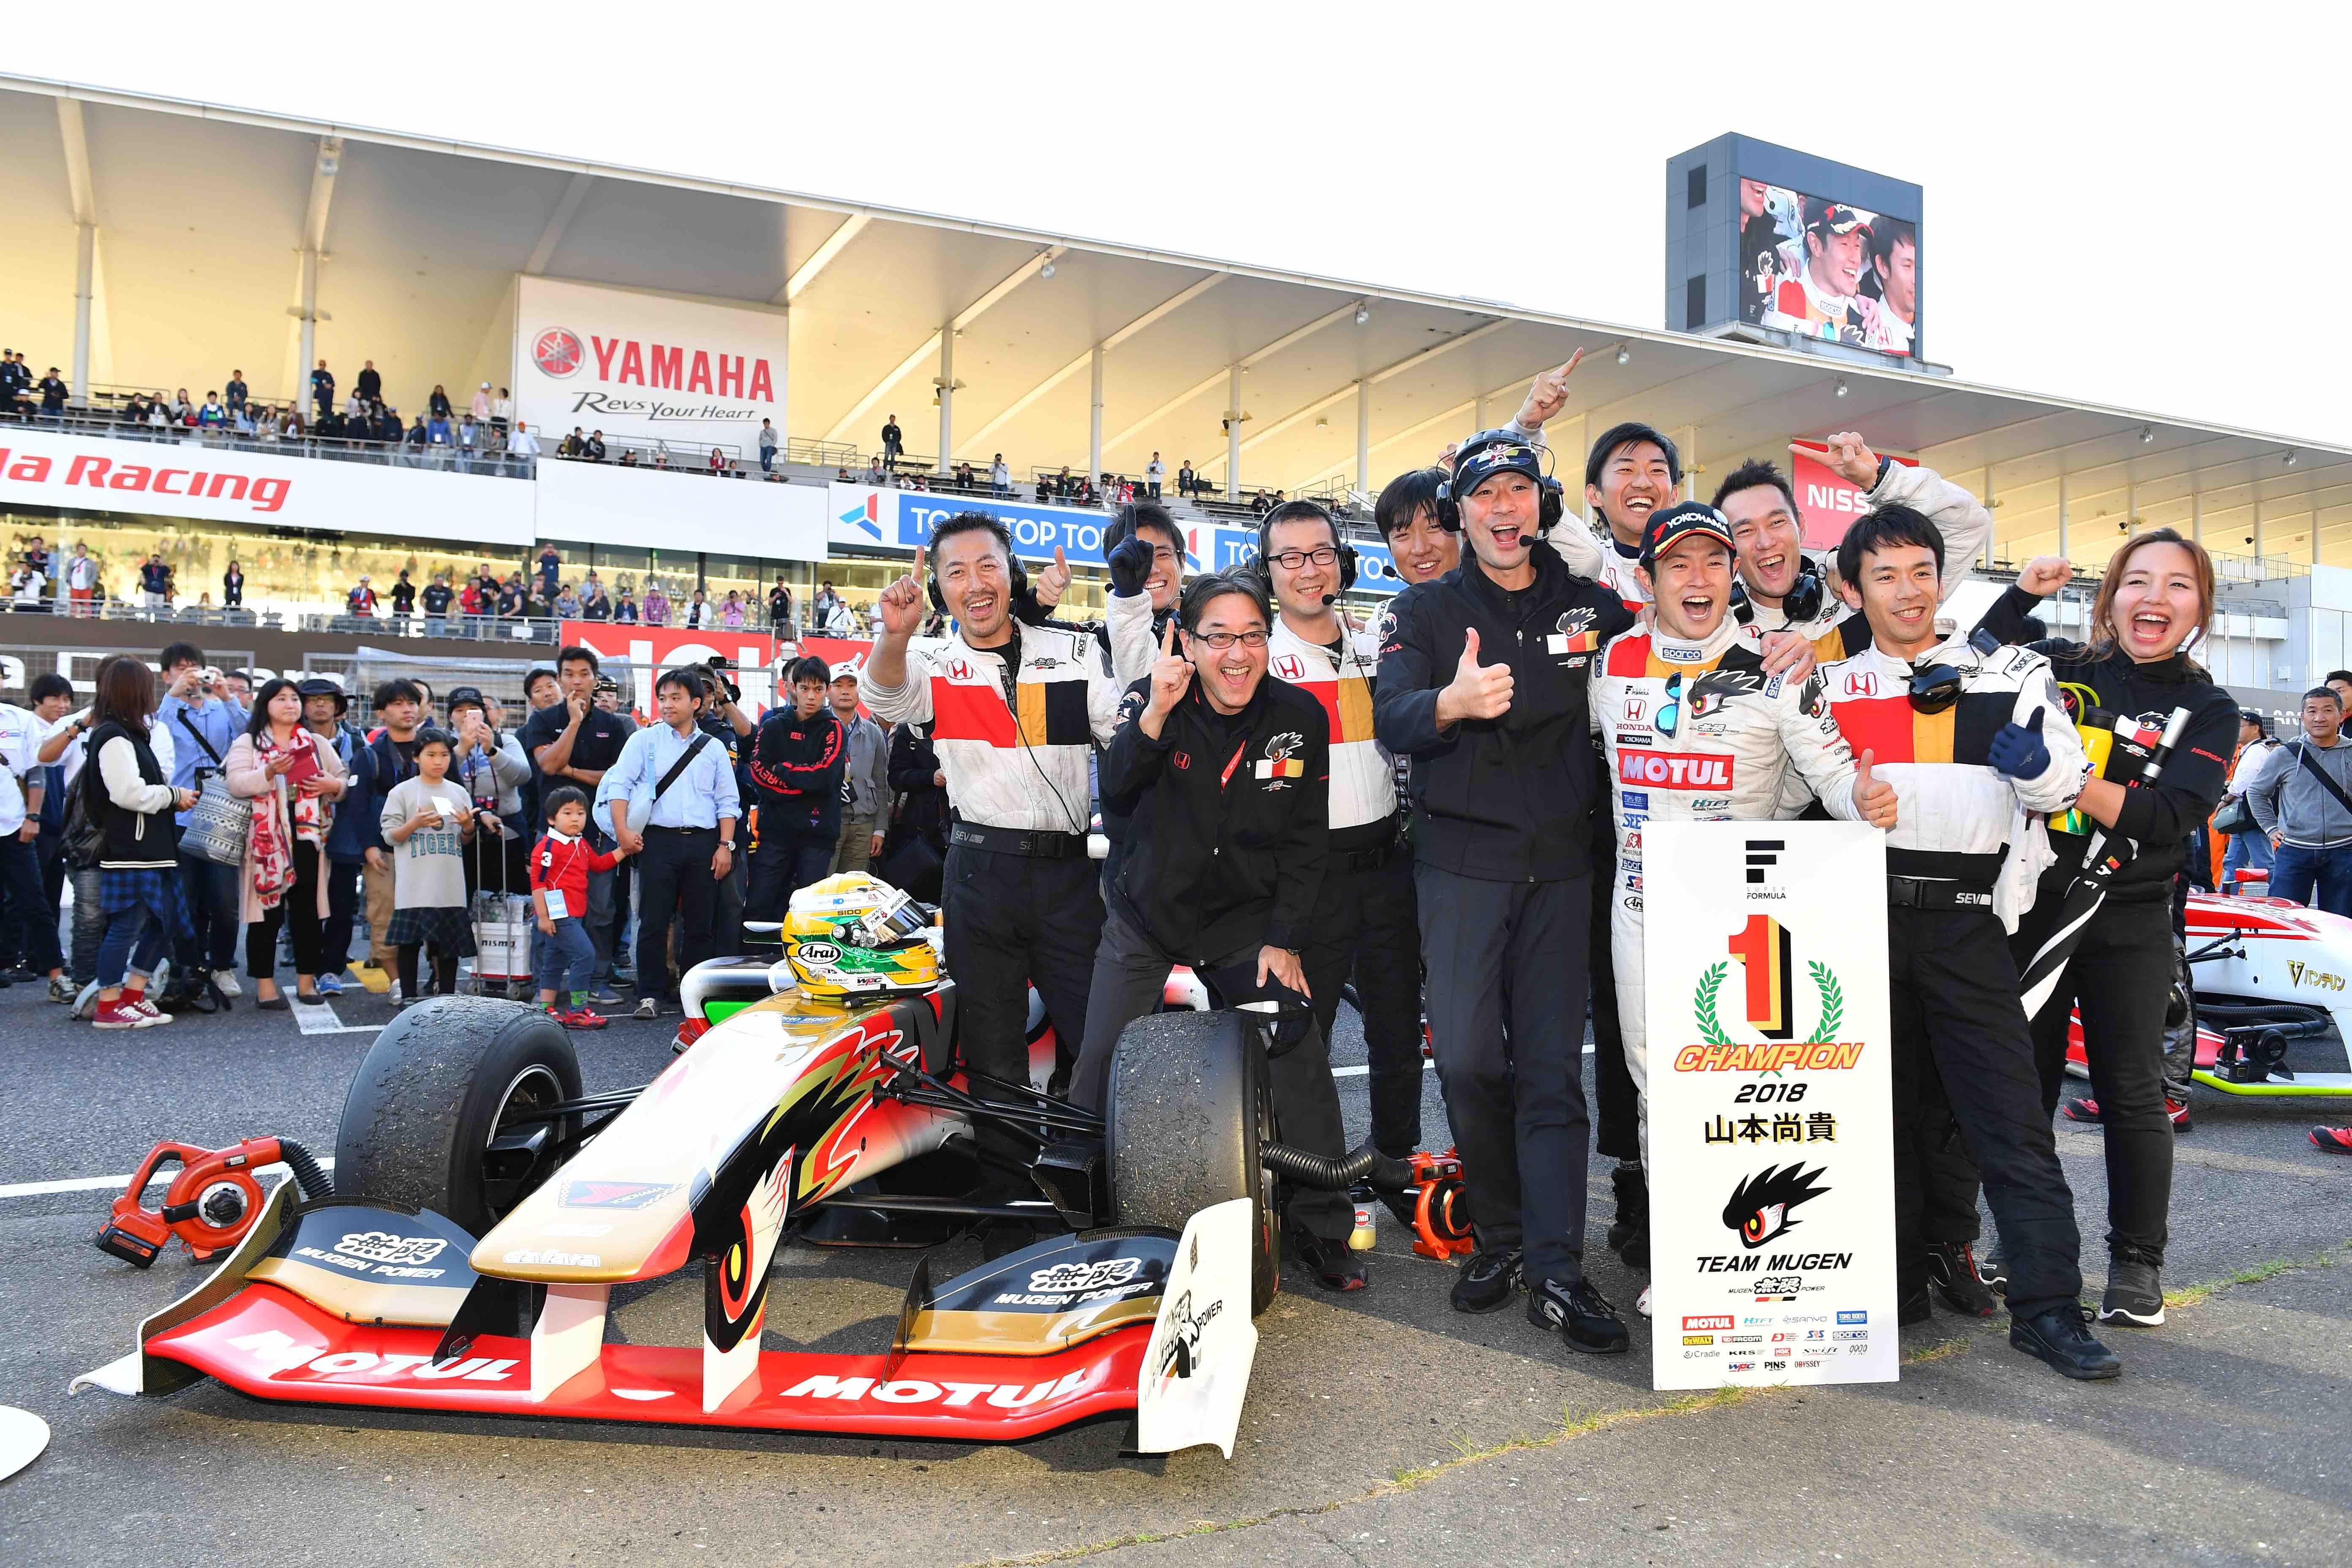 Naoki Yamamoto took his second Super Formula title in Suzuka last weekend behind the wheel of his Team Mugen Honda, following a fierce five-way thriller.